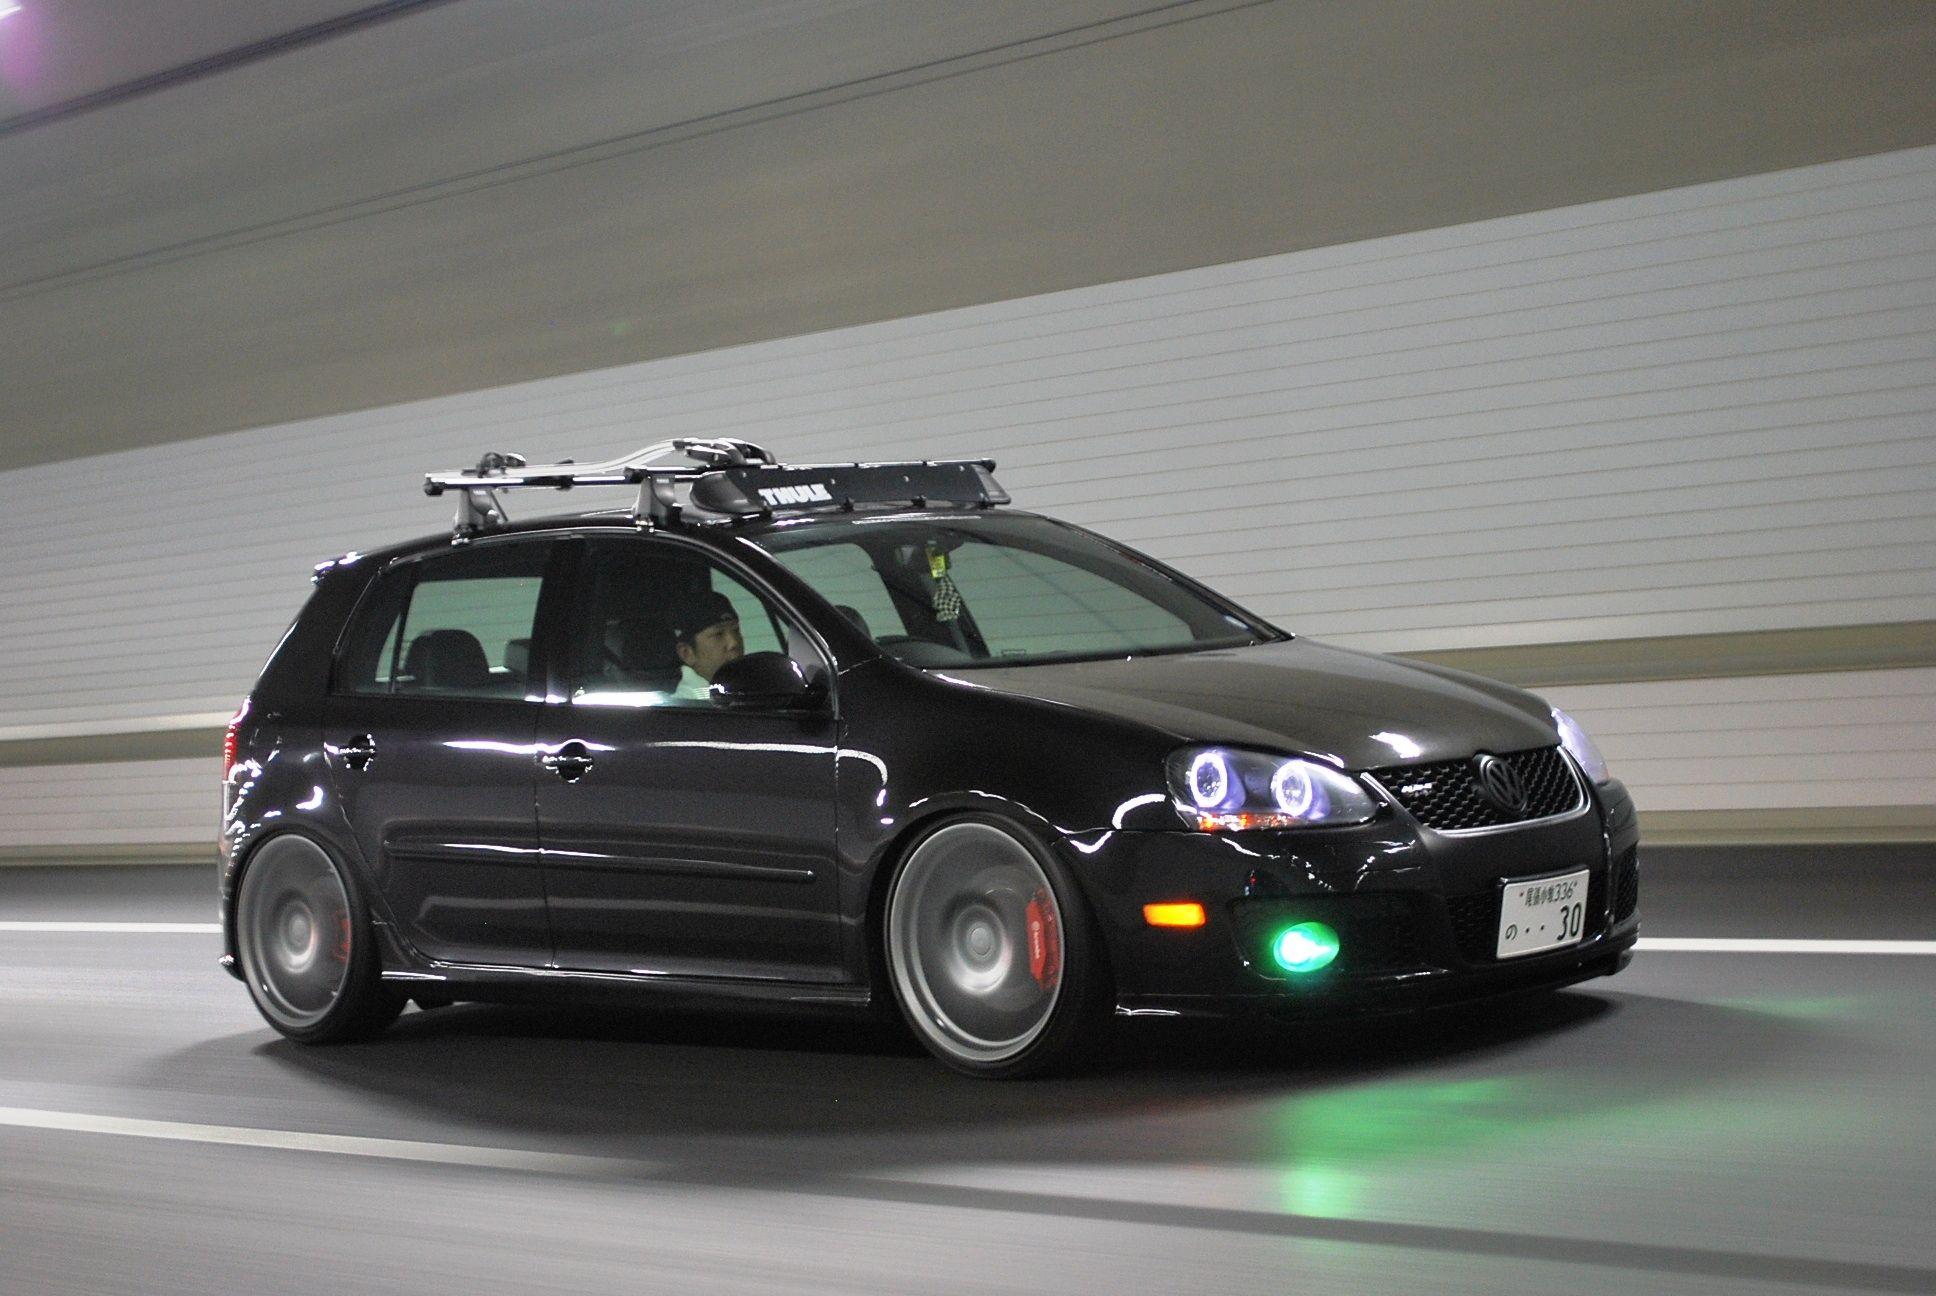 MK5 GTI Cars & Stance Pinterest